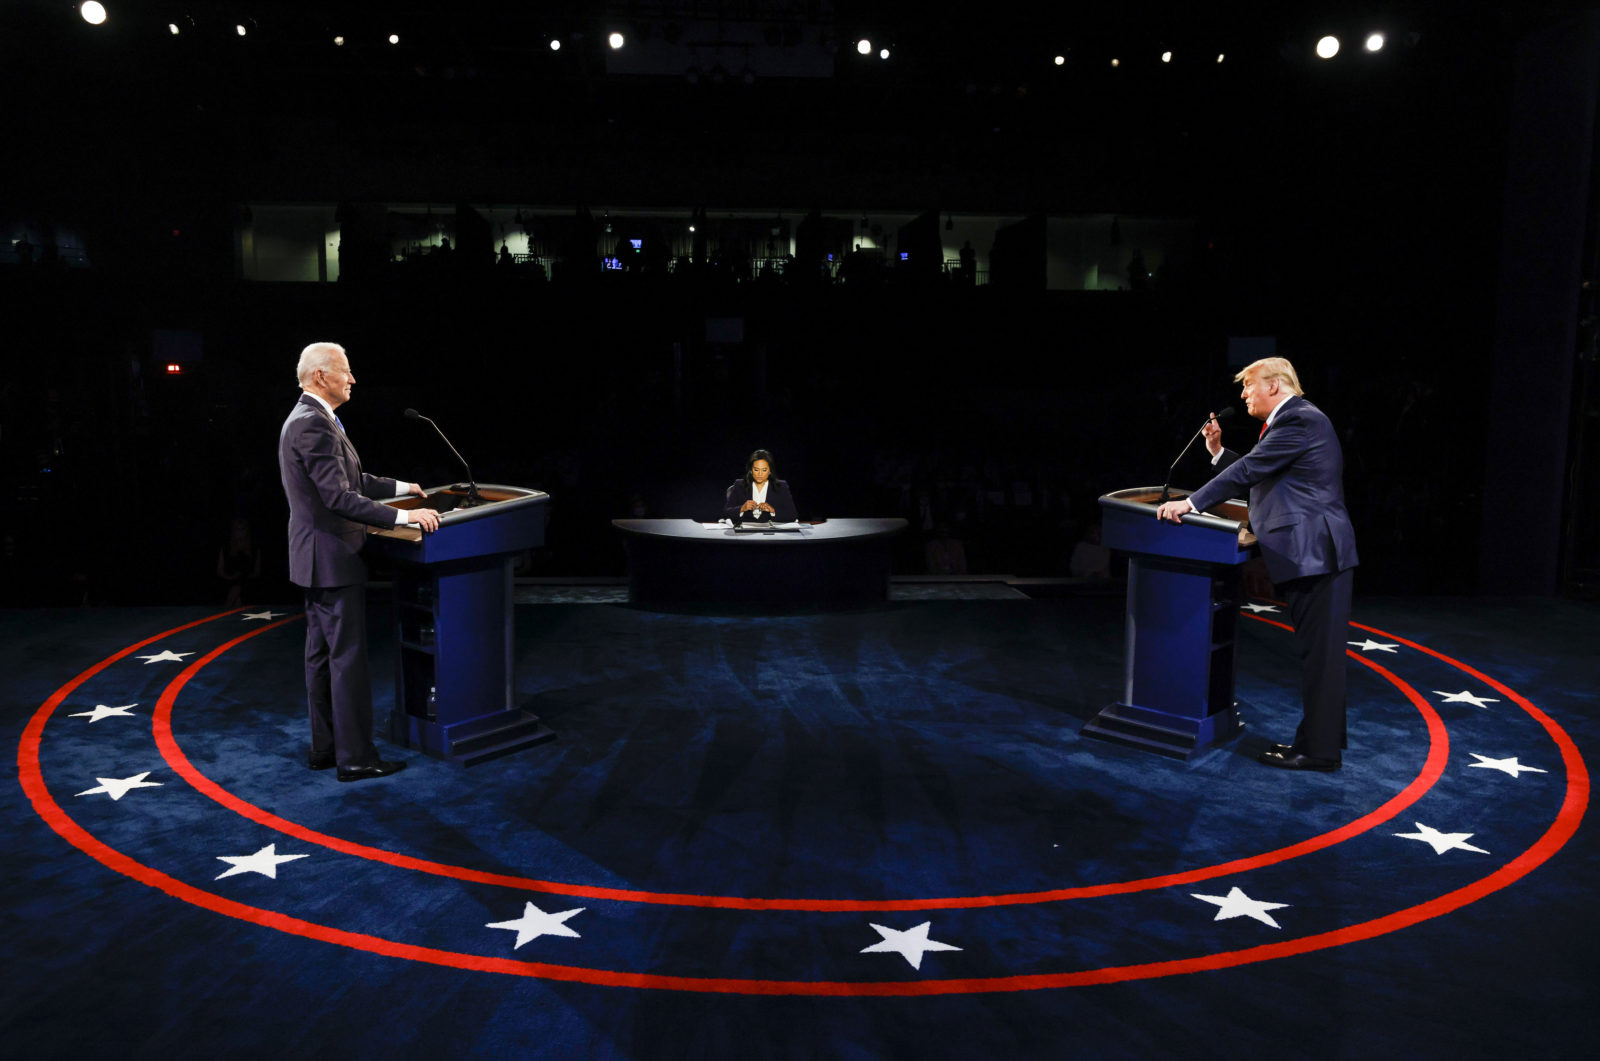 Who won the debate: Donald Trump or Joe Biden?